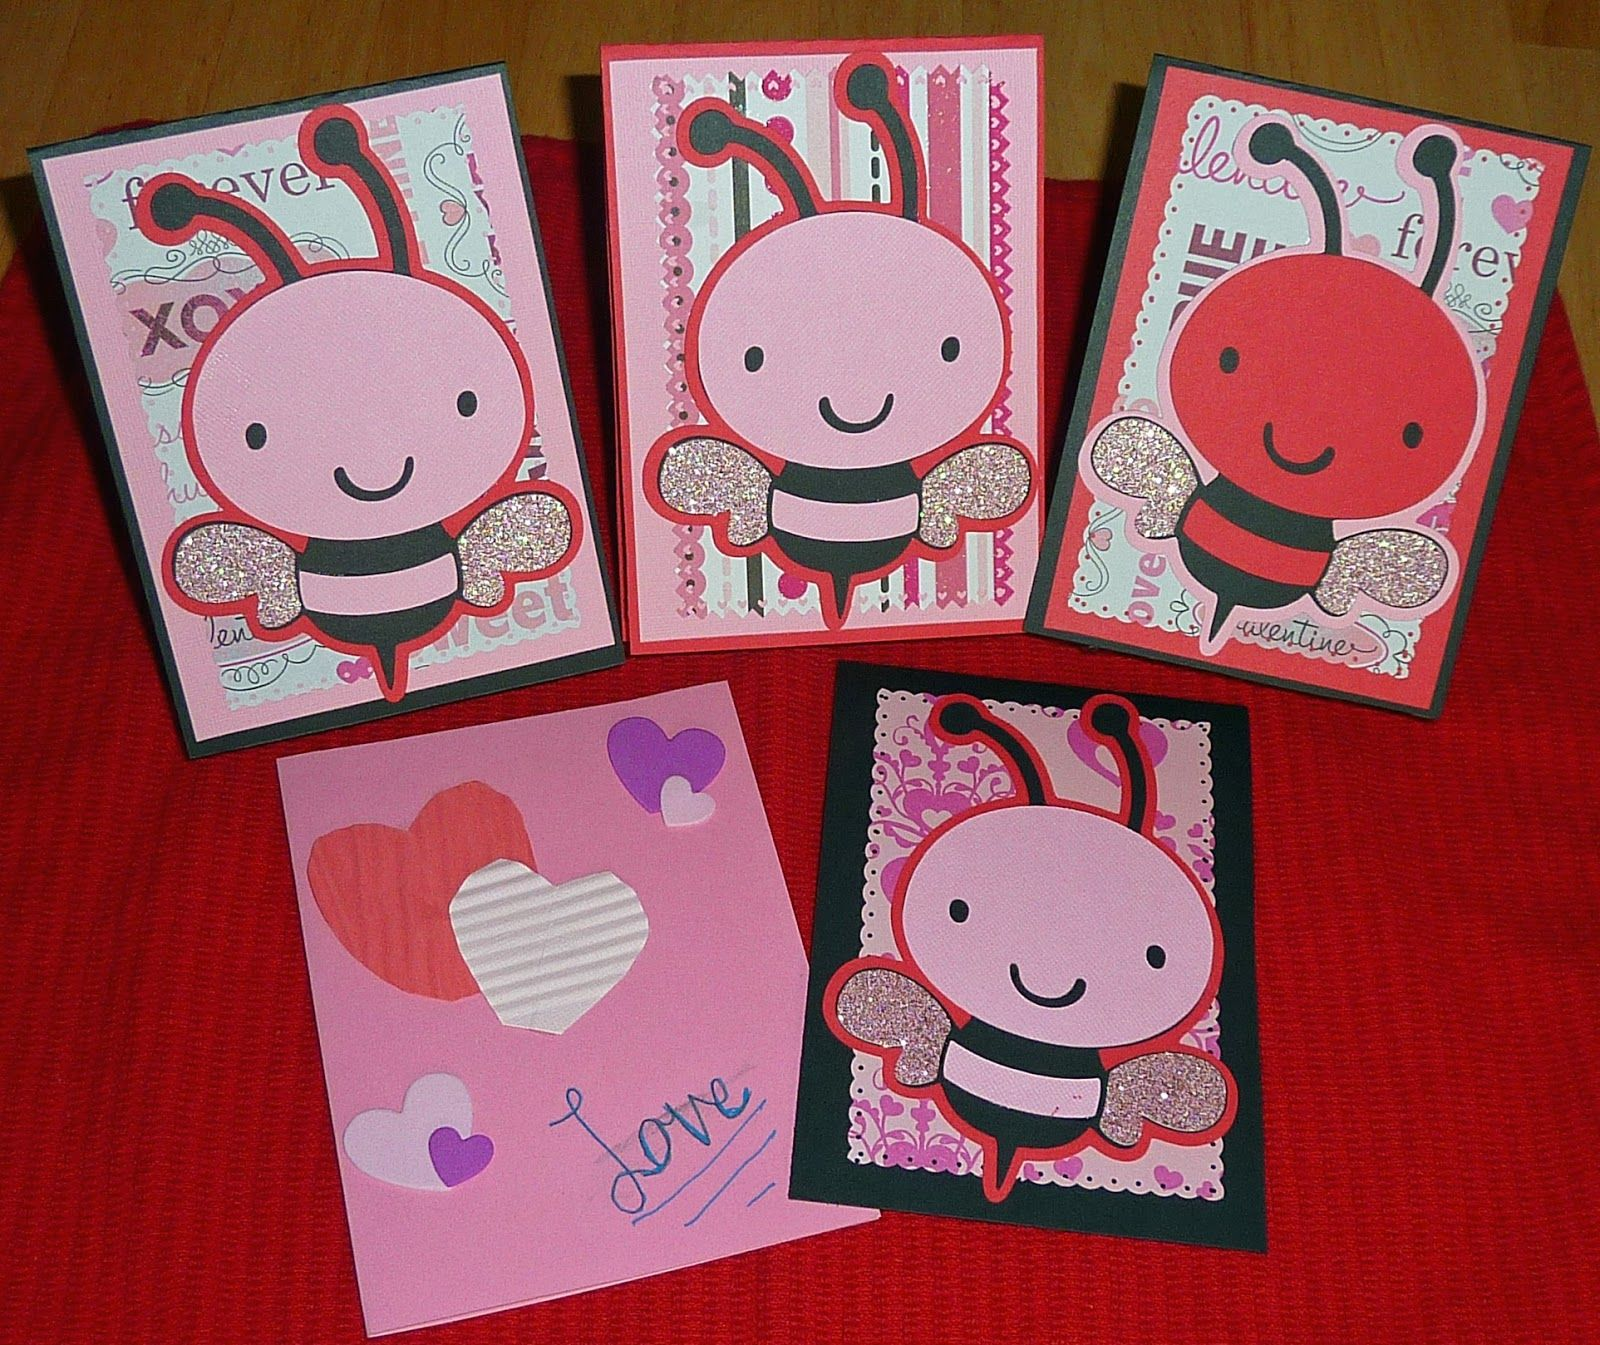 cricut valentine ideas - Google Search   Valentine\'s Day   Pinterest ...